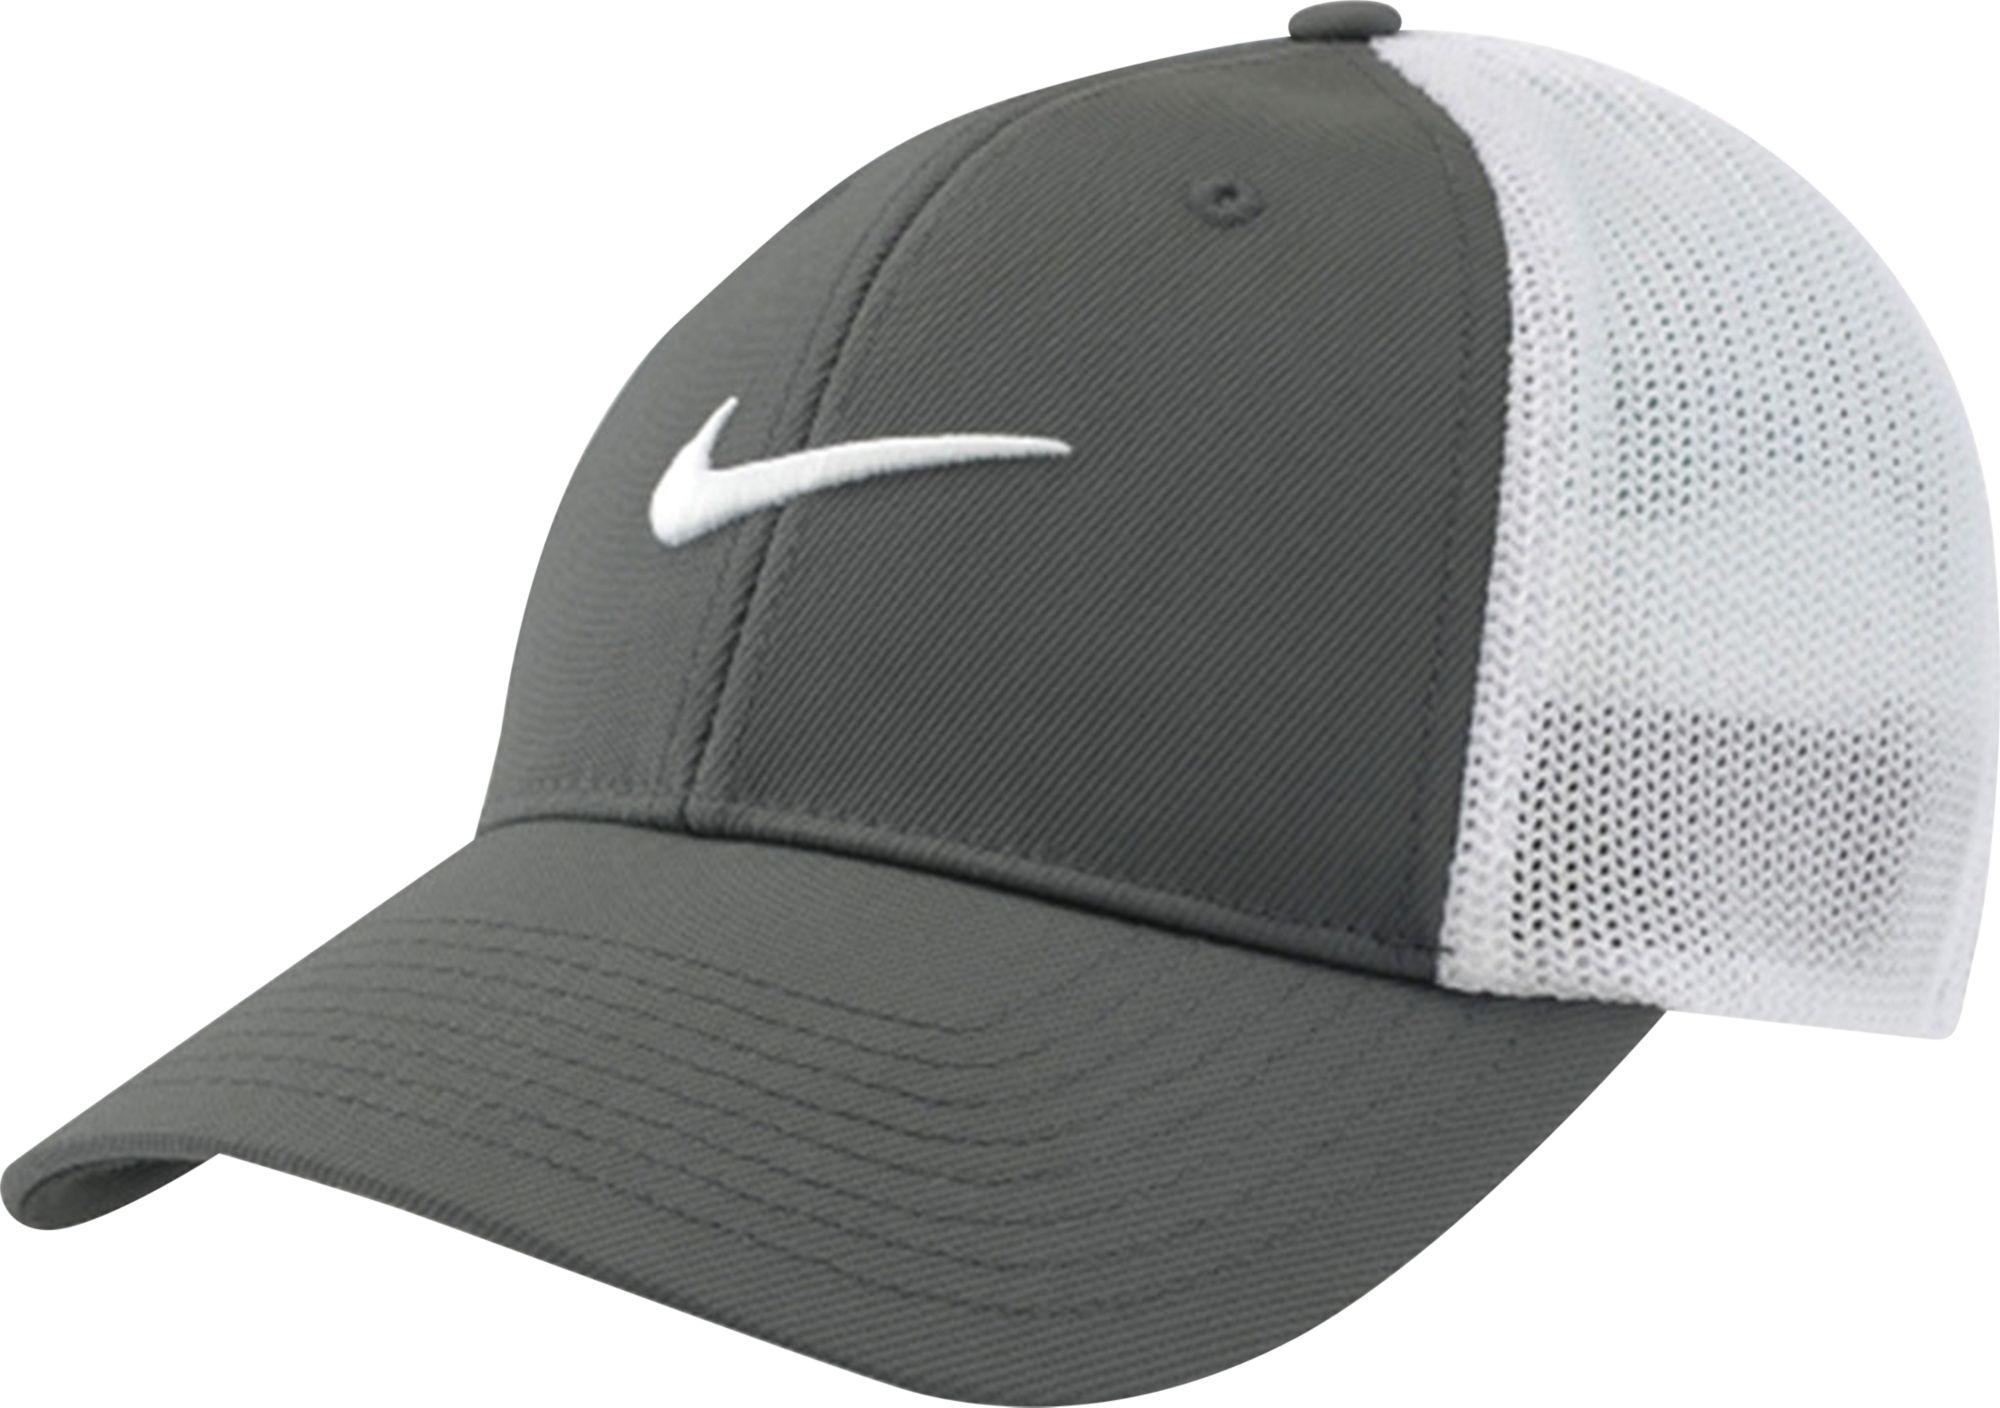 Nike Men's Flex Fit Golf Hat | DICK'S Sporting Goods